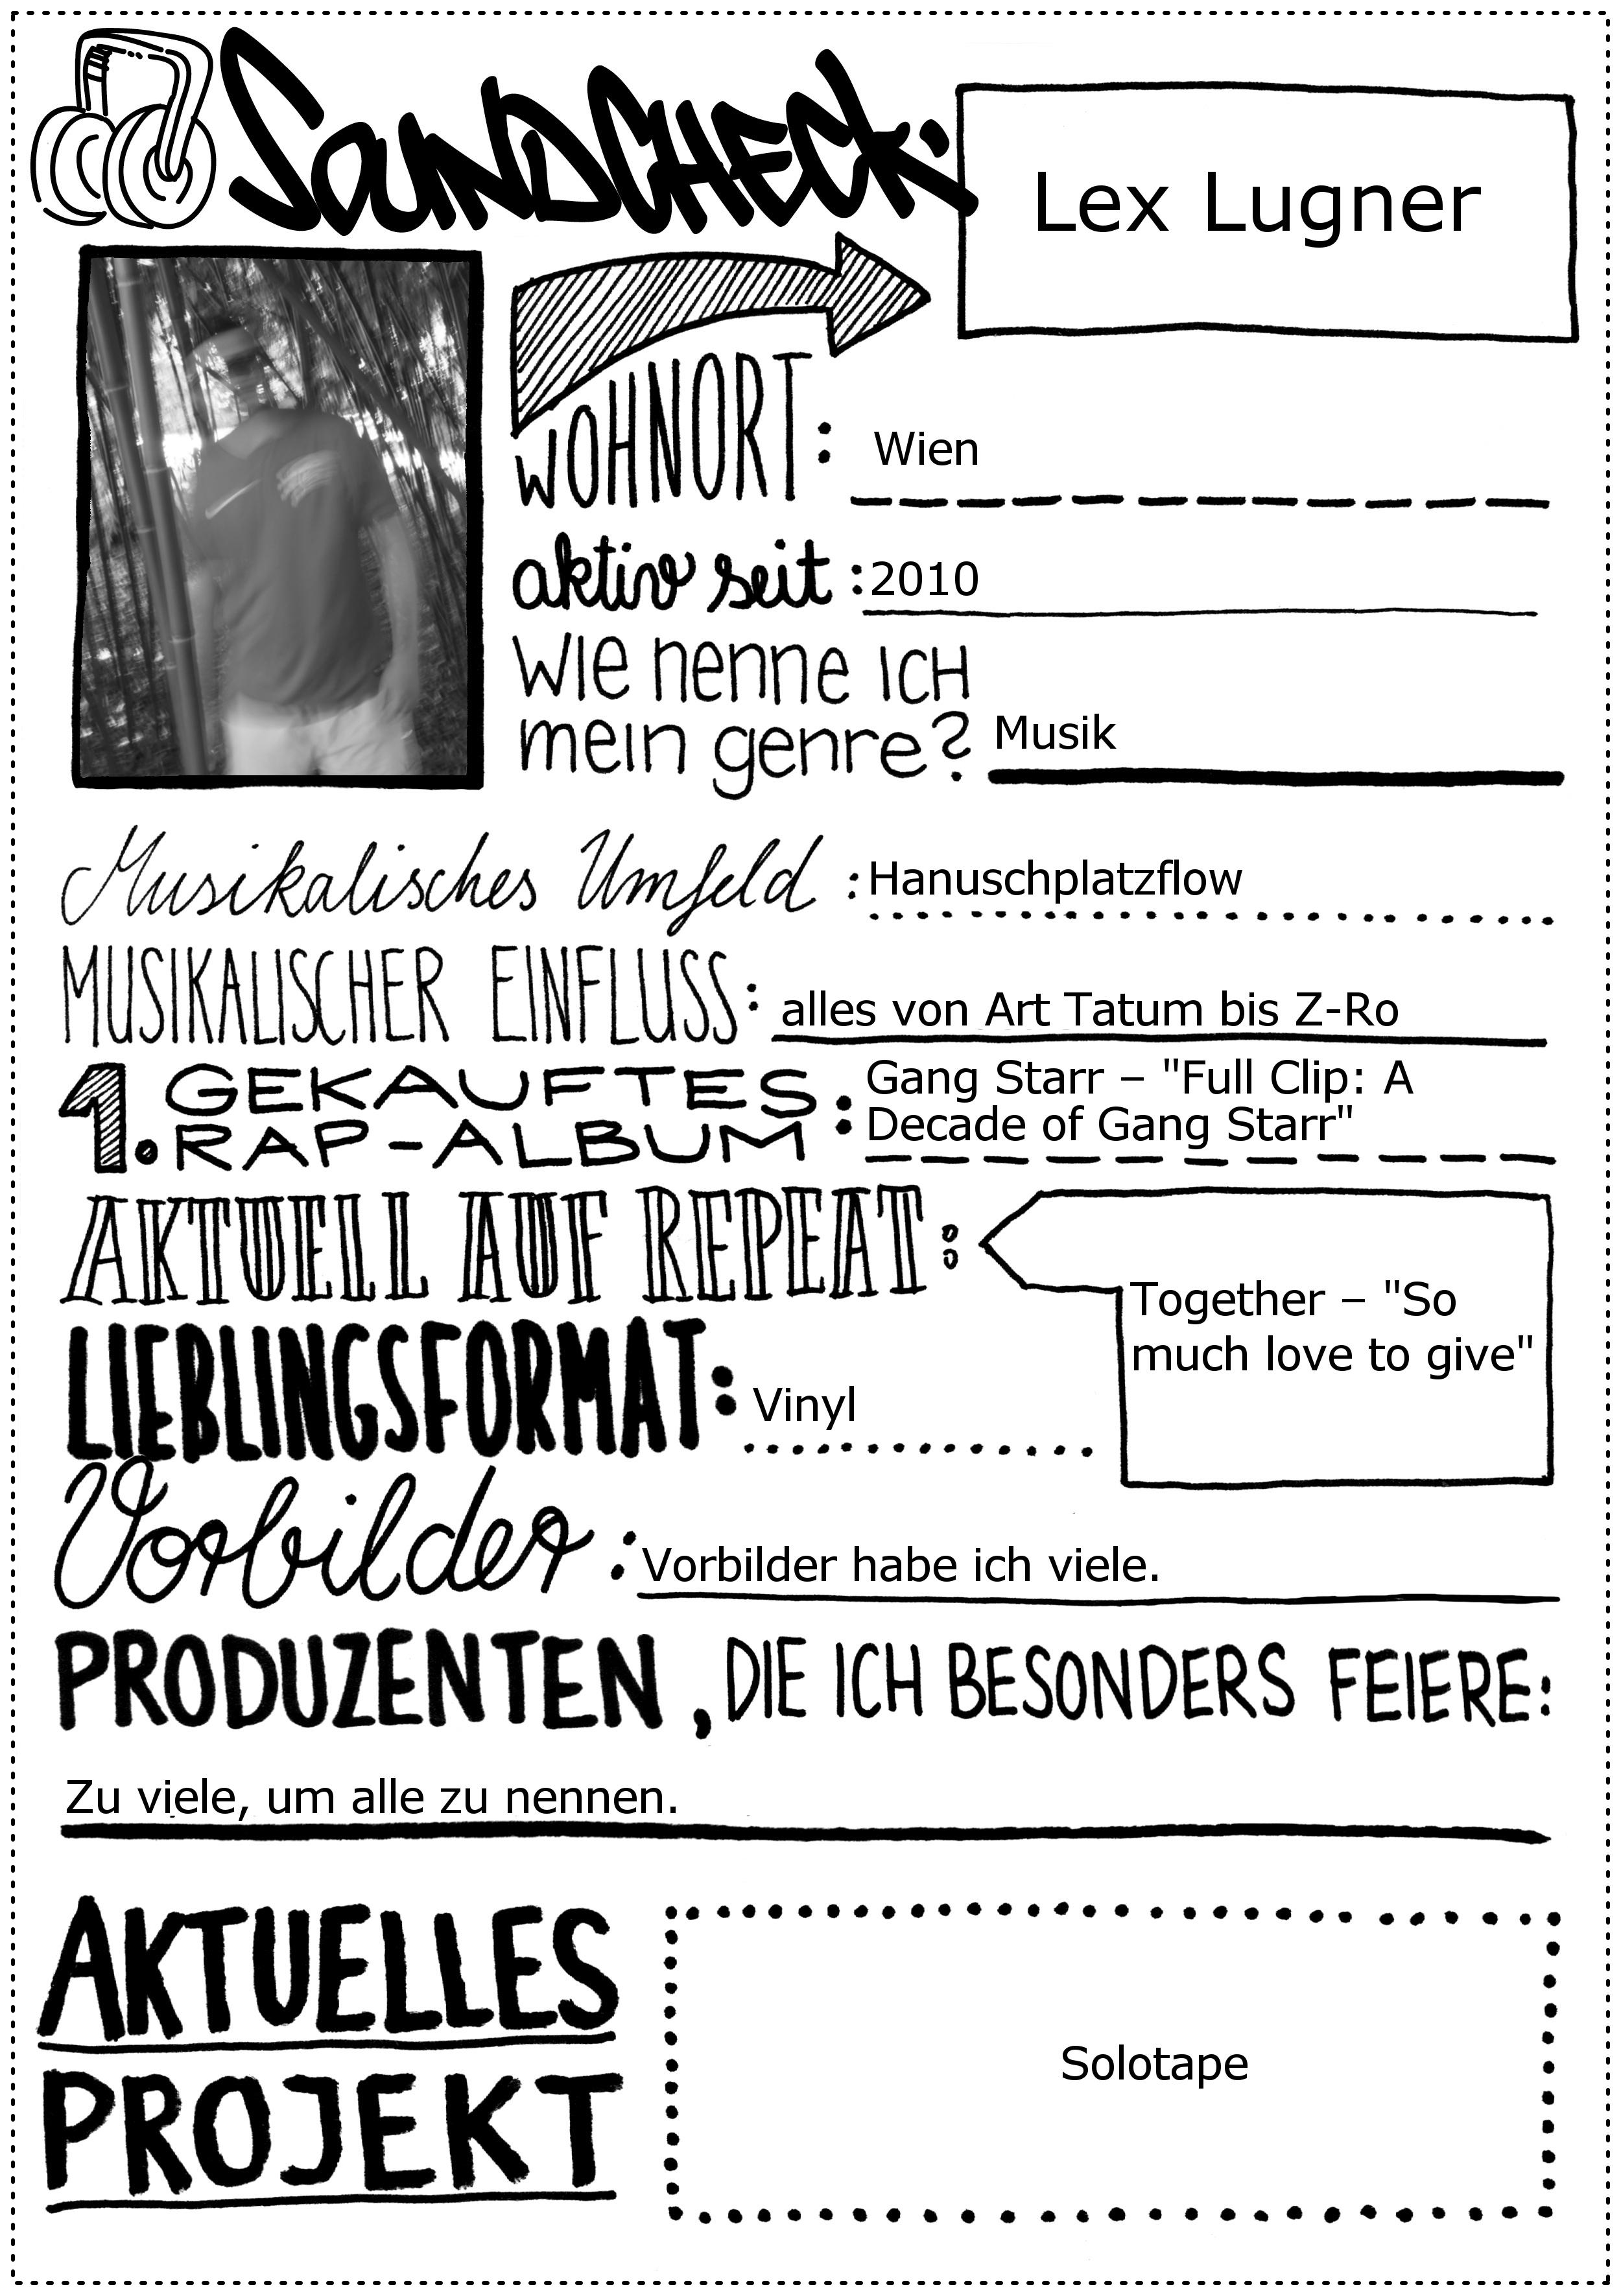 SC_LexLugner_CHECKLISTE